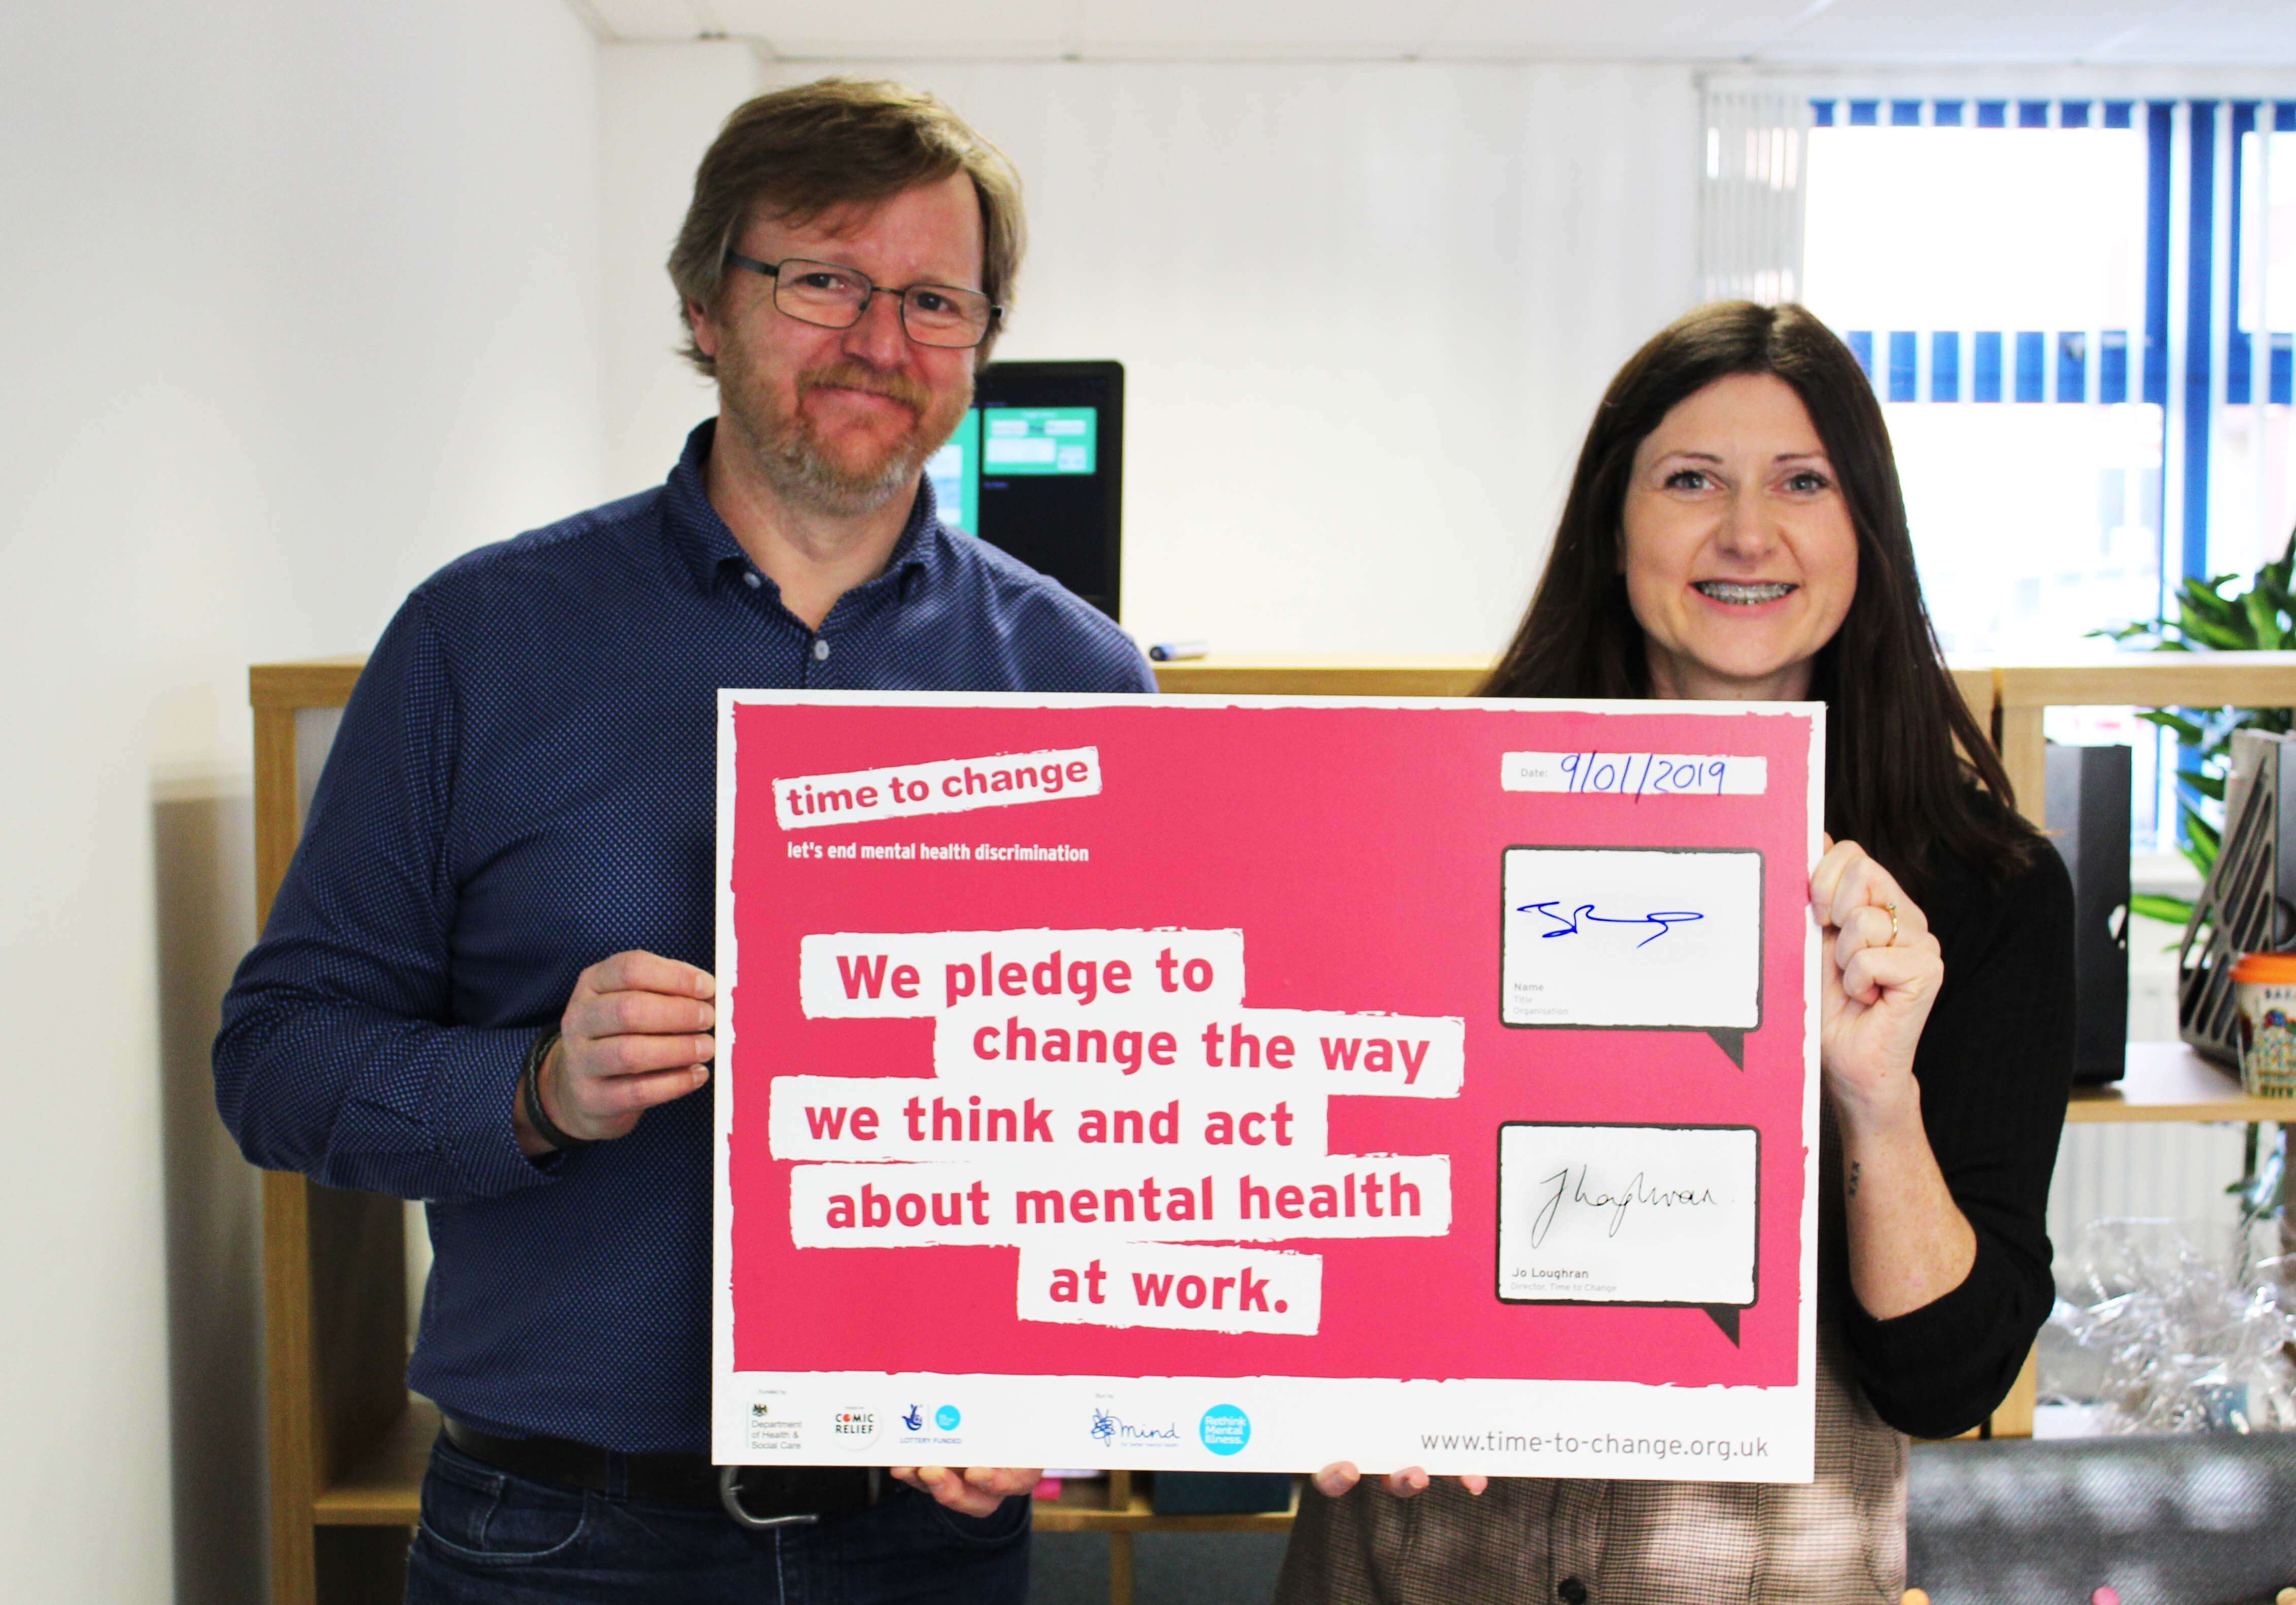 Time to change pledge Breathe spot workplace depression